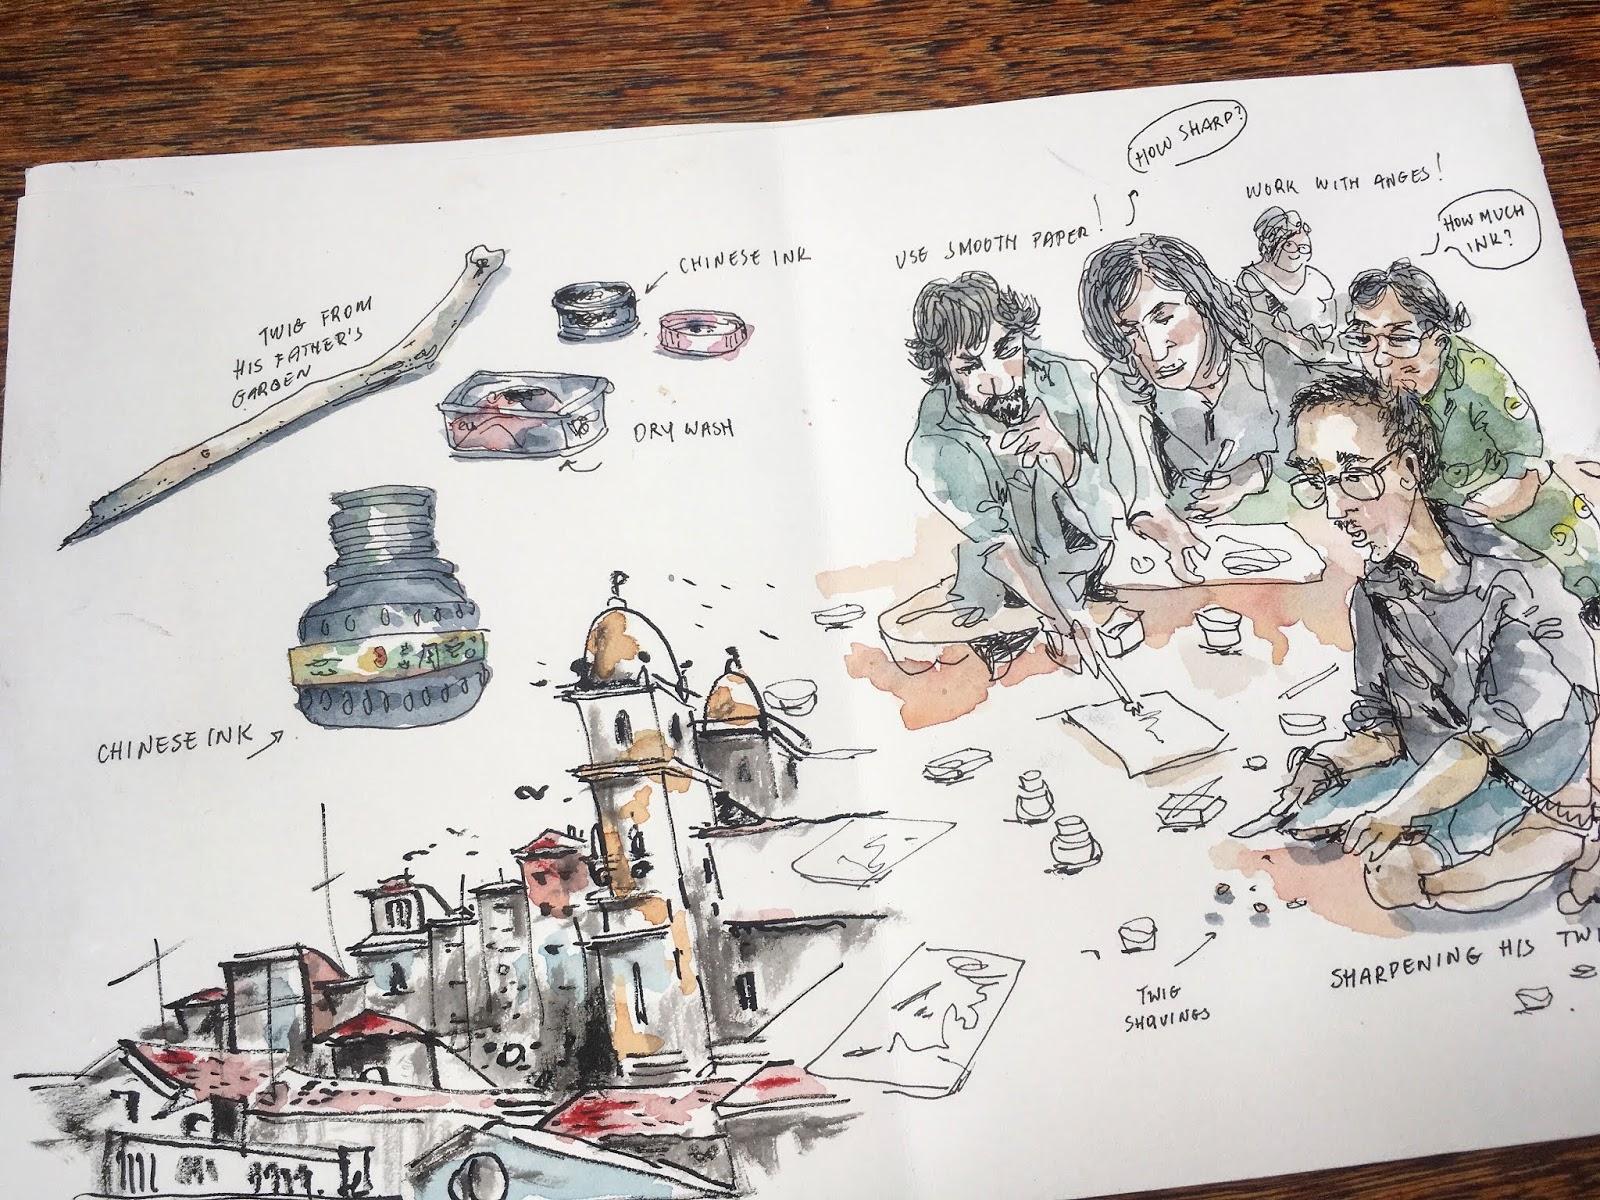 Kiah Kieans Sketching With Dry Twig & Chinese Ink